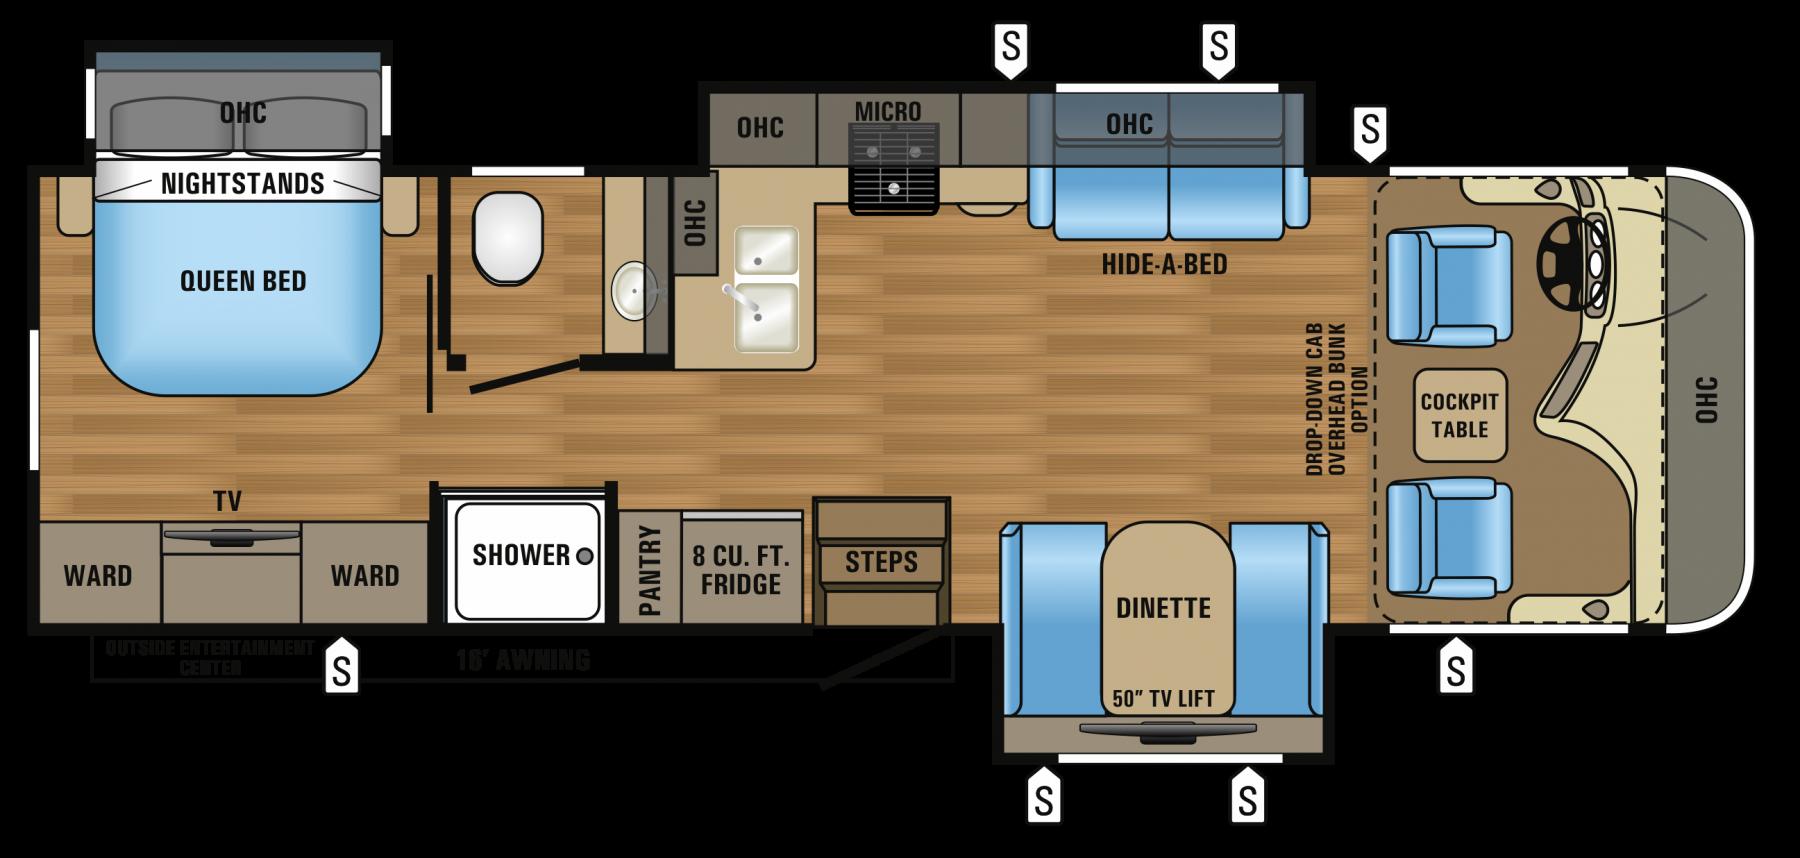 2017 Precept 31UL Floorplan Rv floor plans, Travel